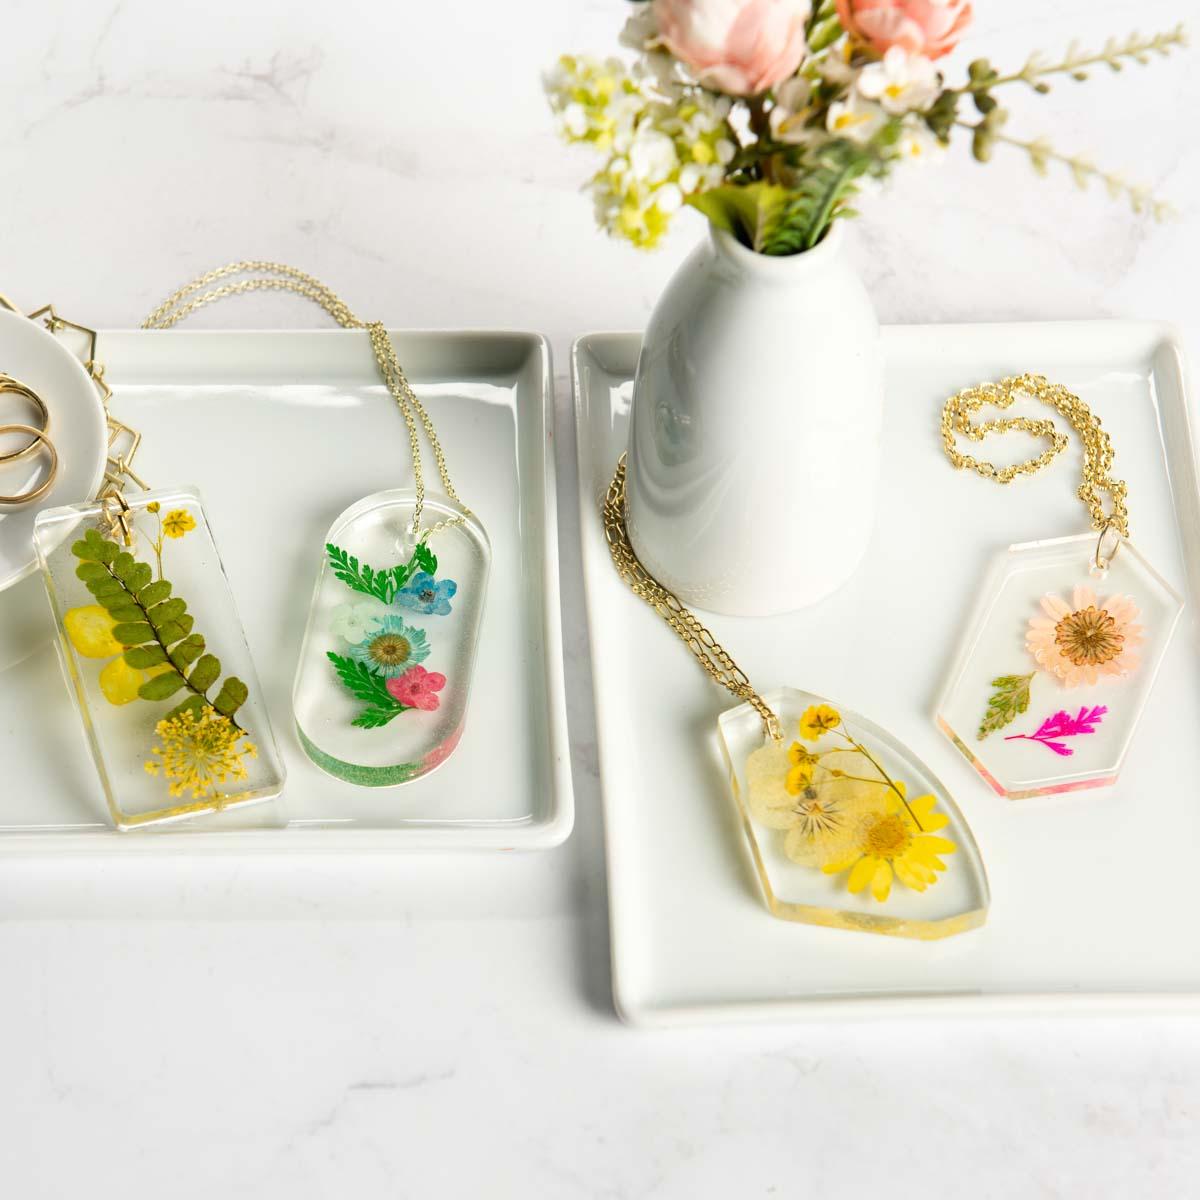 Mod Podge resin necklace pendants